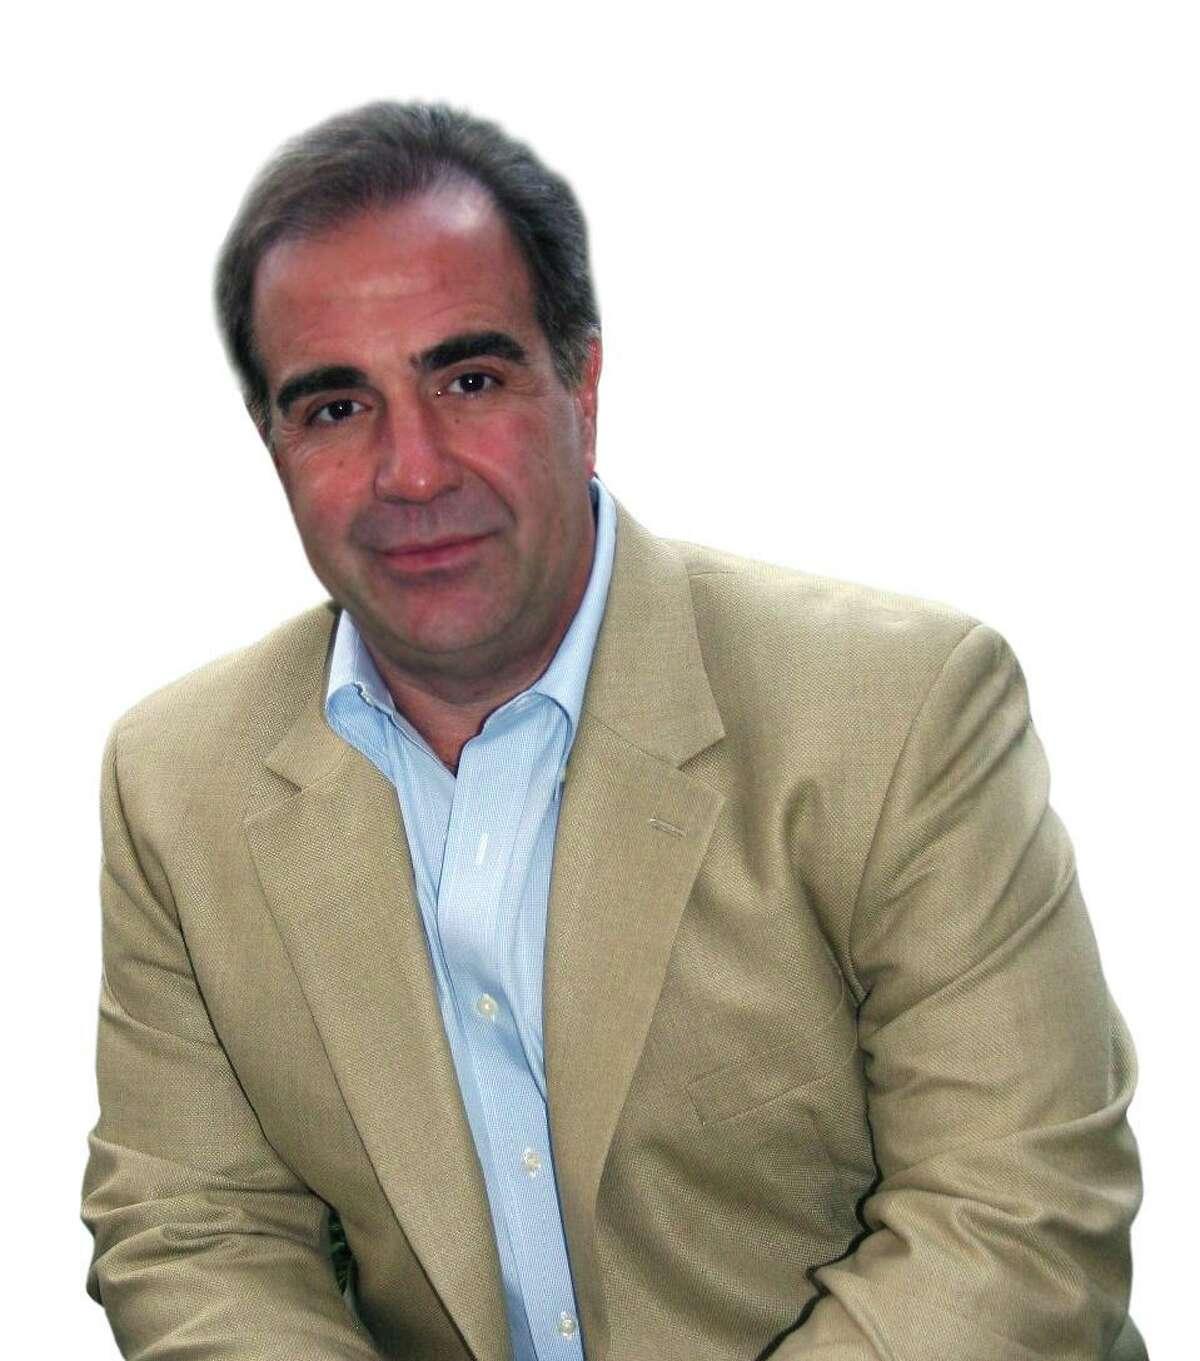 Anthony Ardino